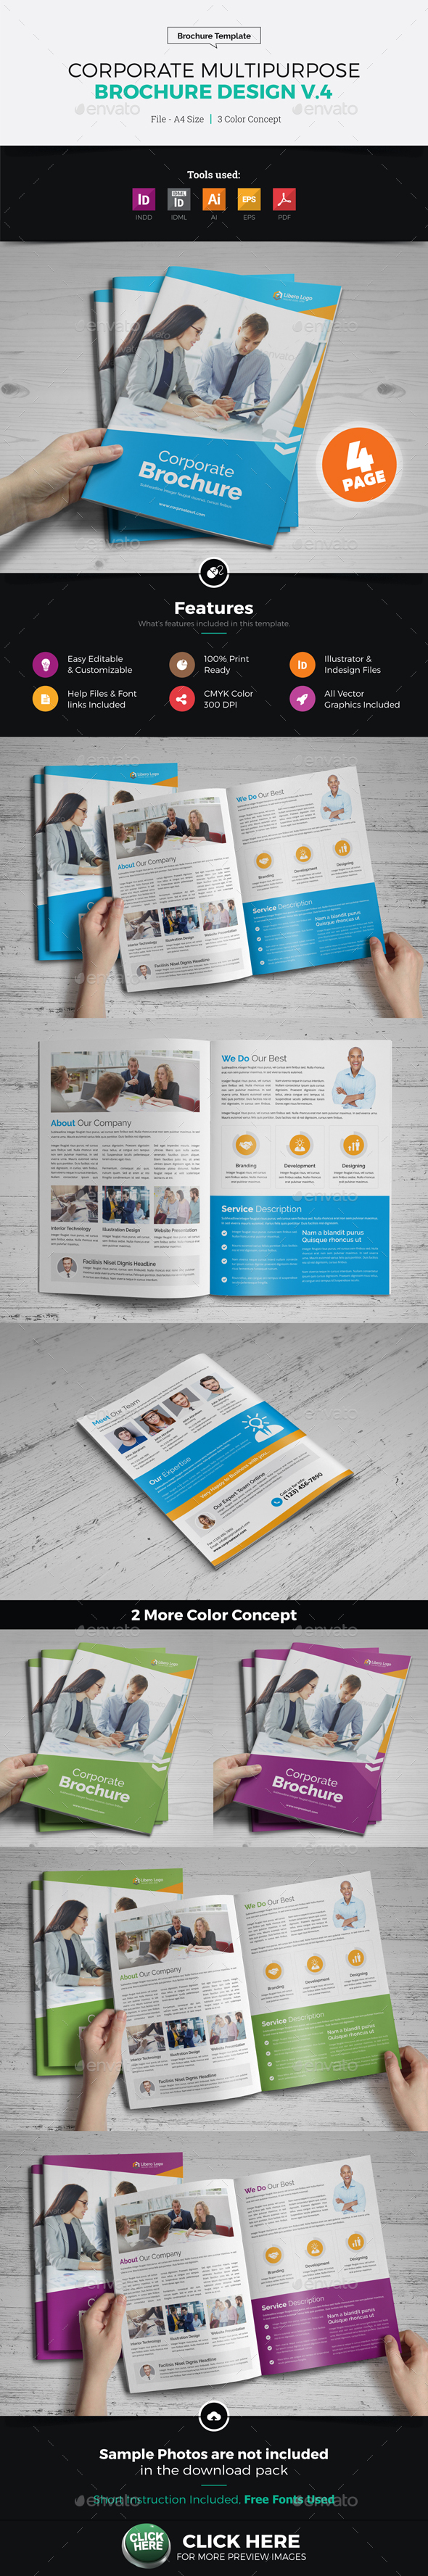 Corporate Multipurpose Brochure Design v4 - Corporate Brochures